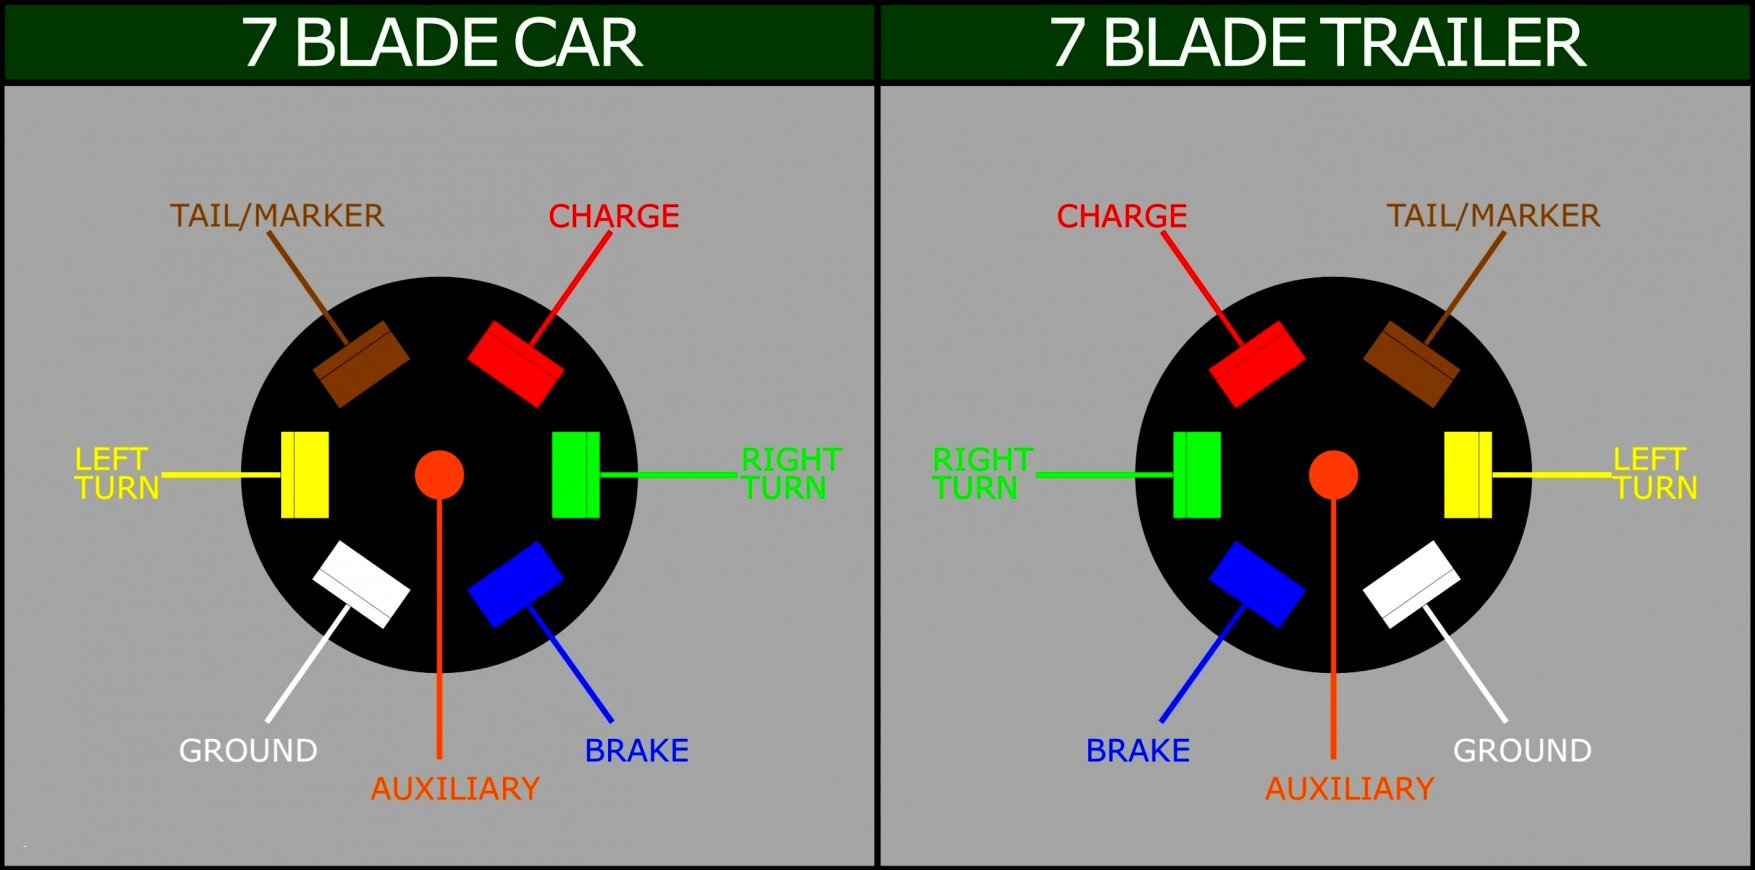 Pollak 12 705 Trailer Plug Wiring Diagram | Wiring Diagram - Pollak Trailer Plug Wiring Diagram